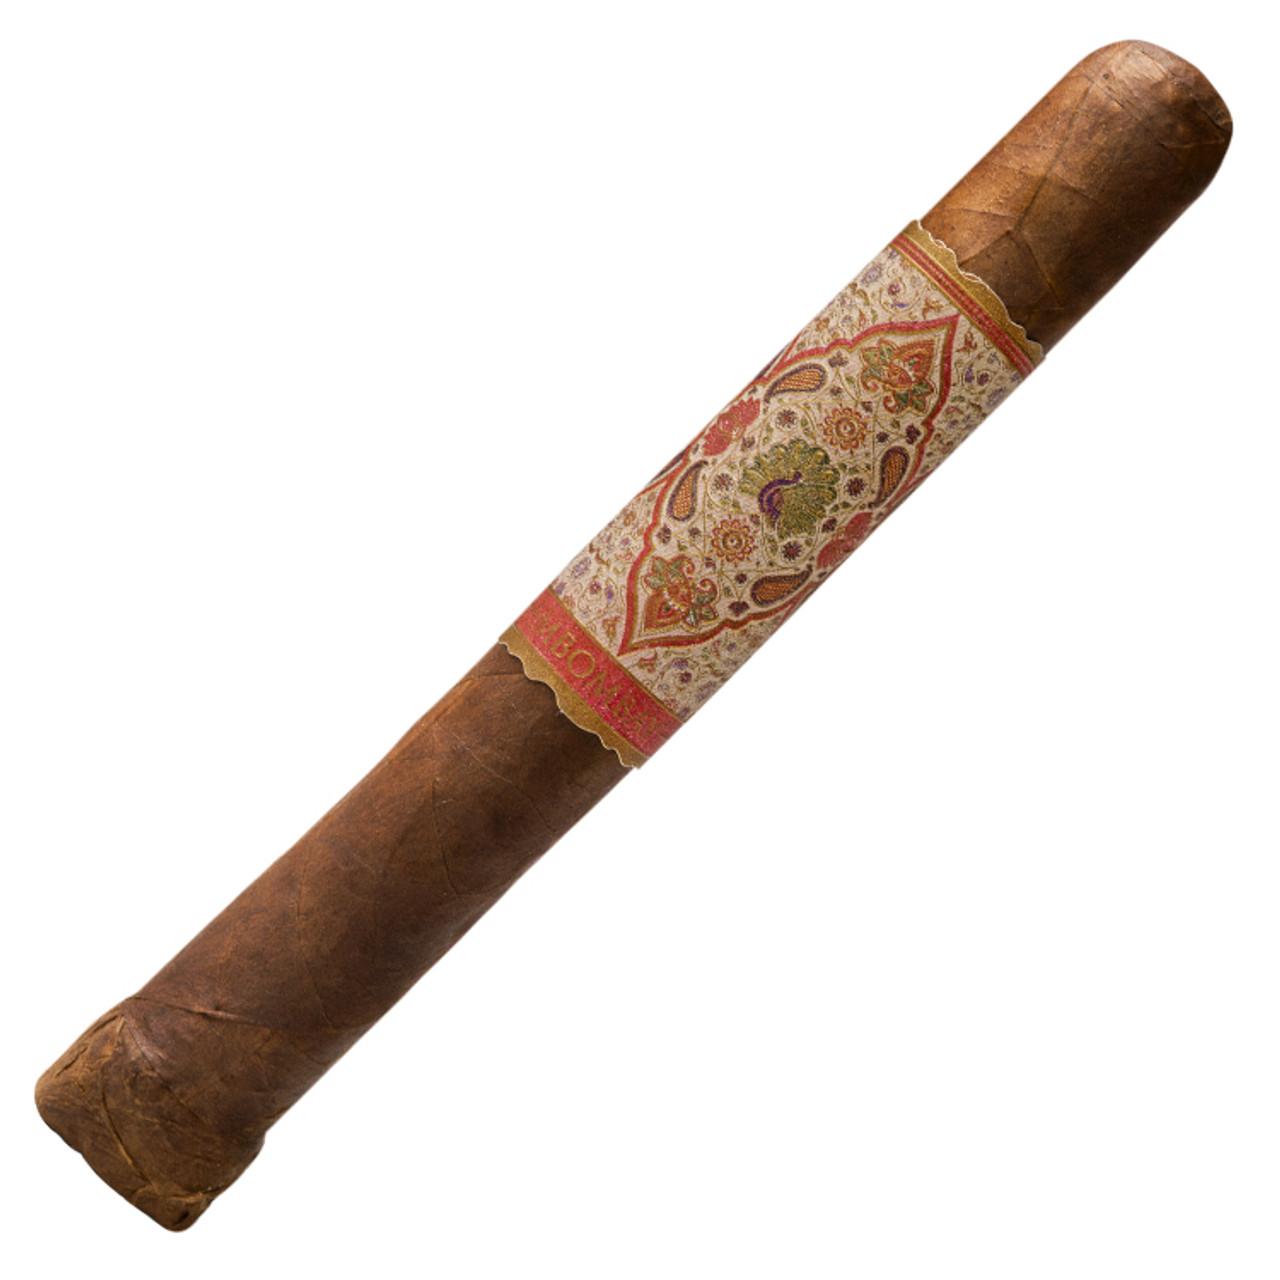 MBombay Mora Toro Cigars - 6.5 x 52 (Box of 20)